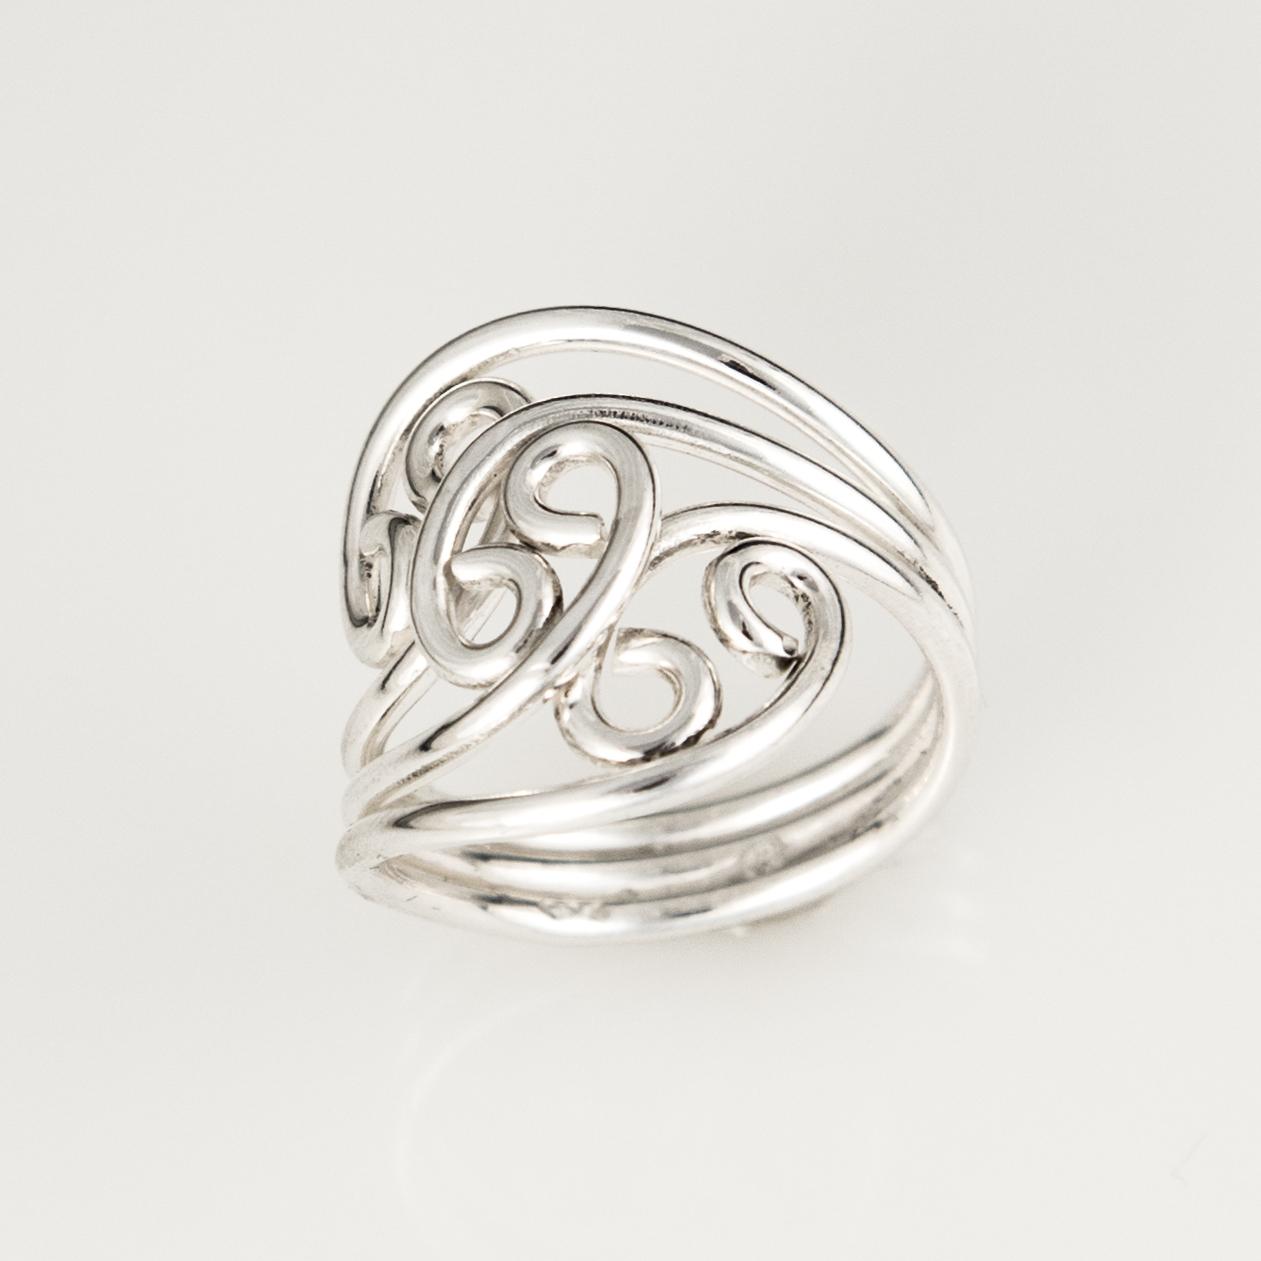 Triple Flower Sterling Silver Ring